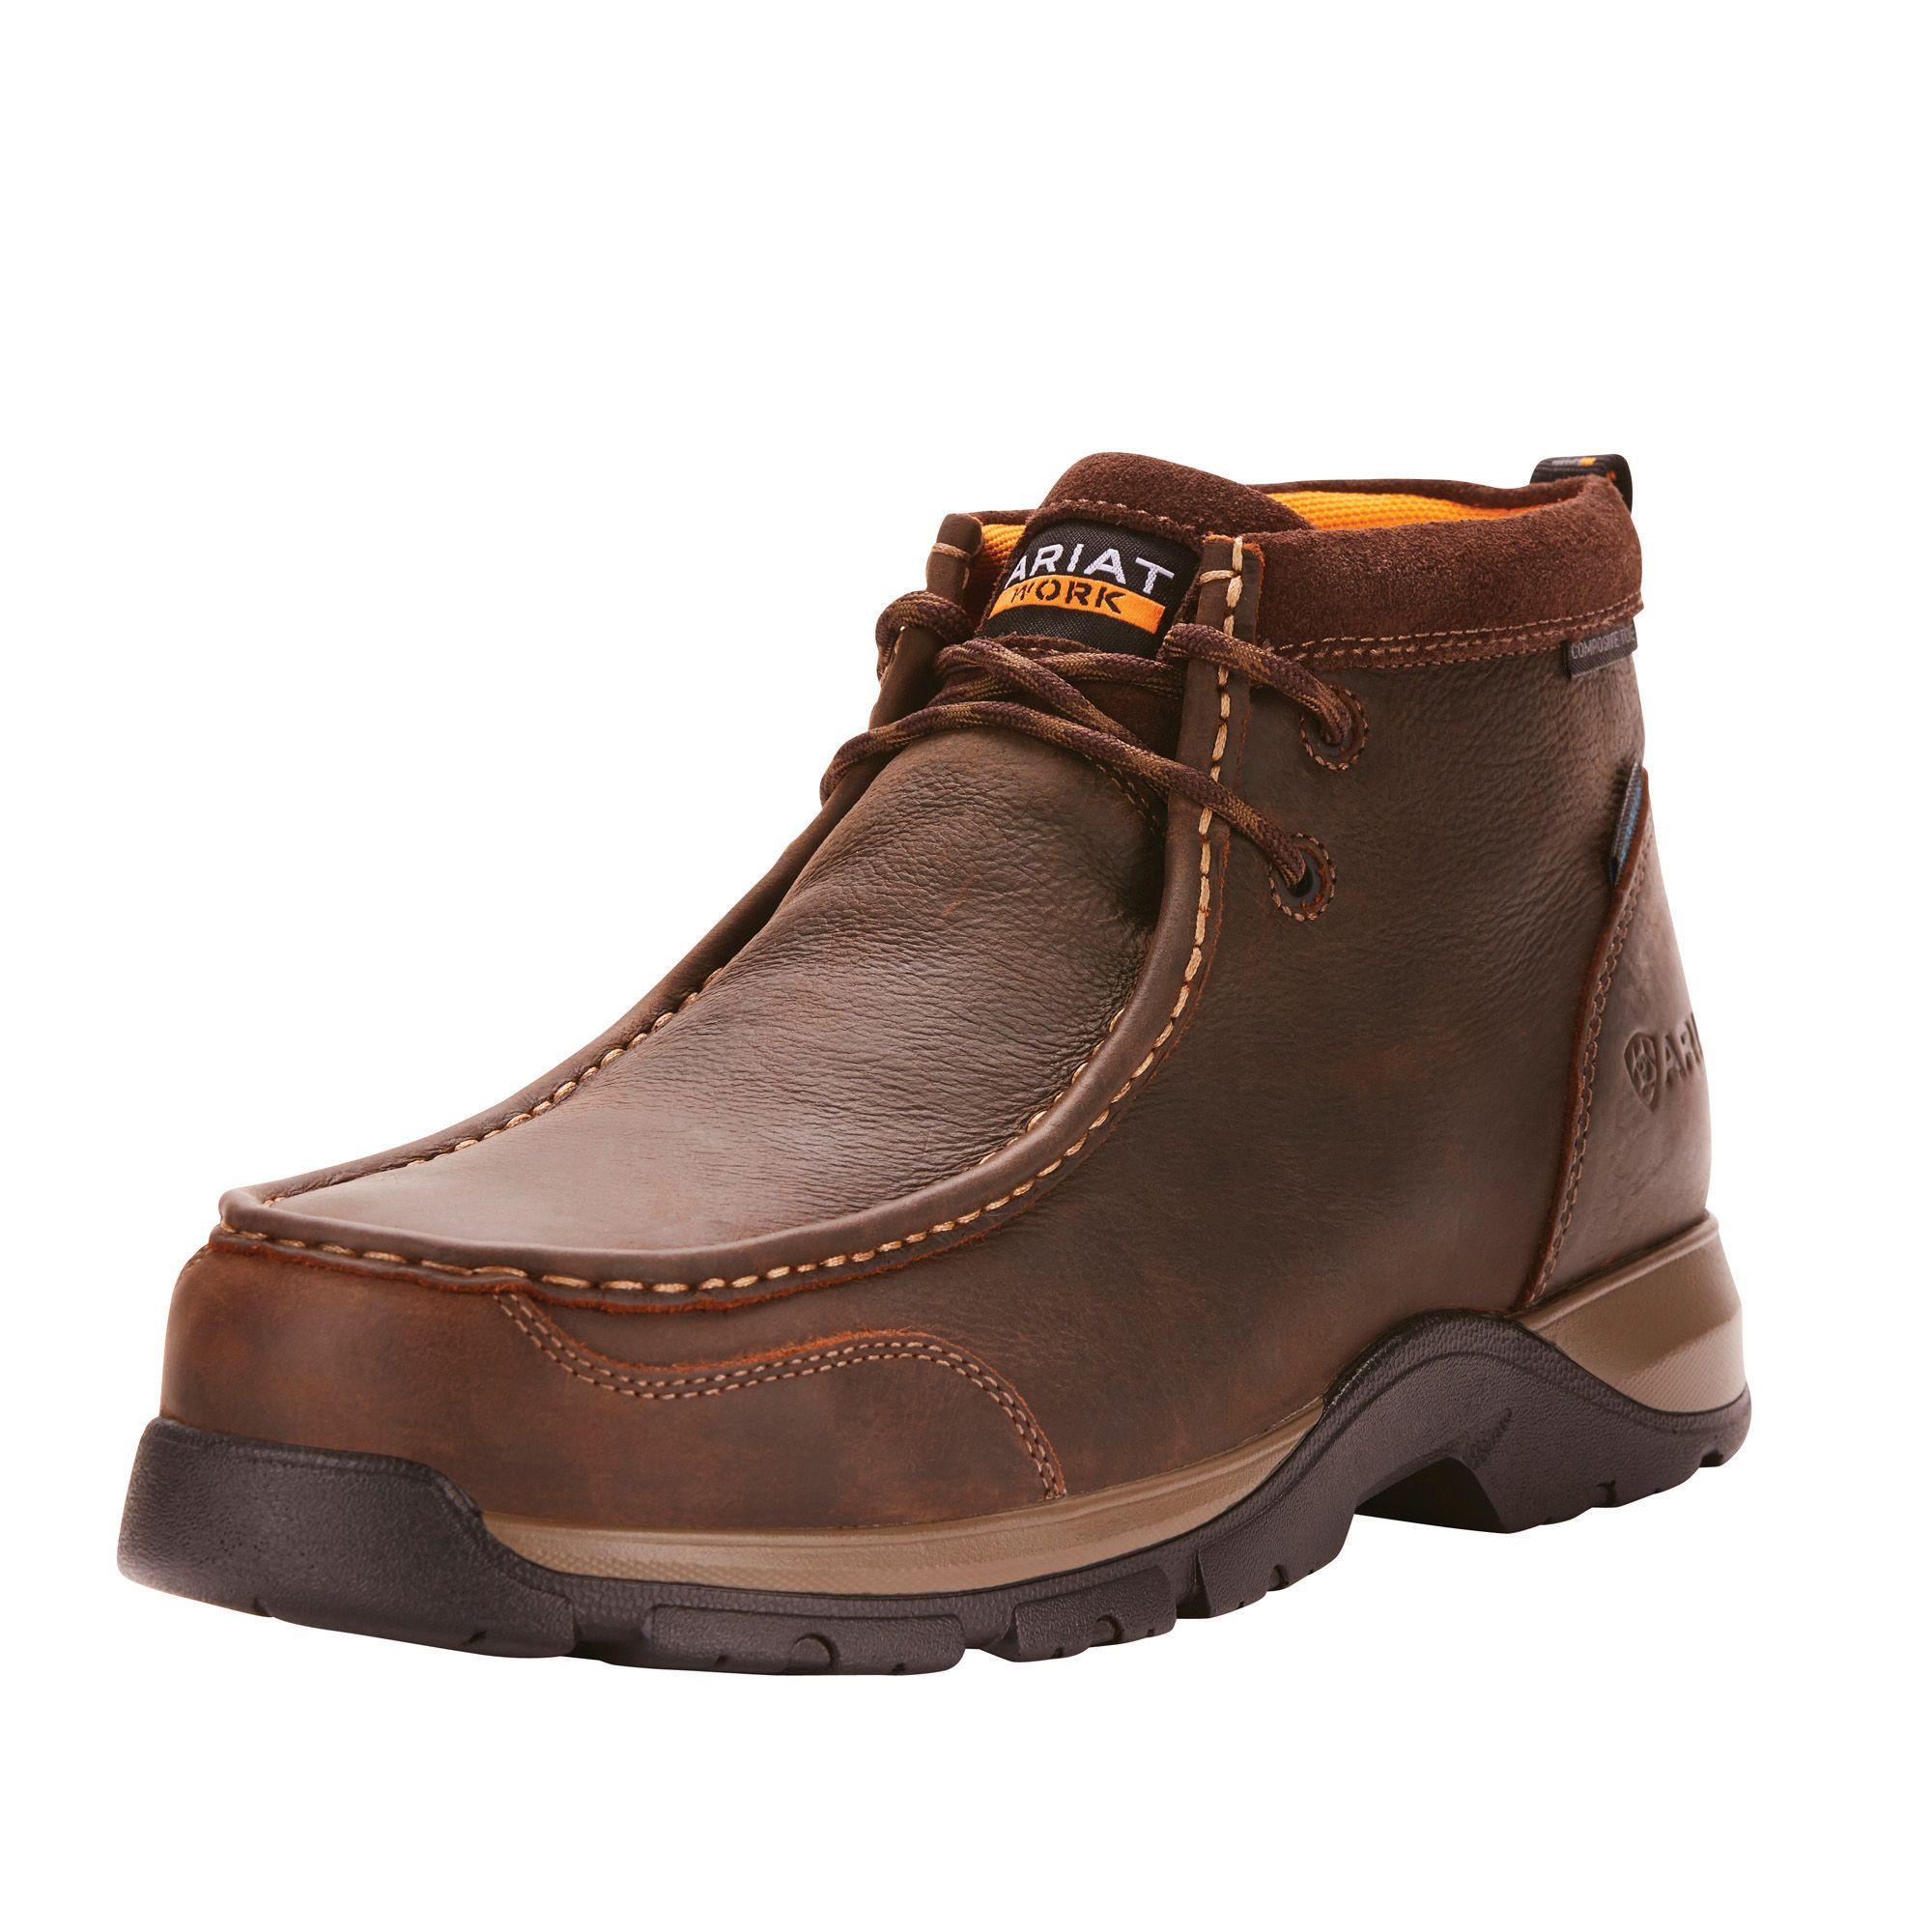 Edge Lte Moc Waterproof Composite Toe Work Boot Composite Toe Work Boots Boots Dark Brown Leather